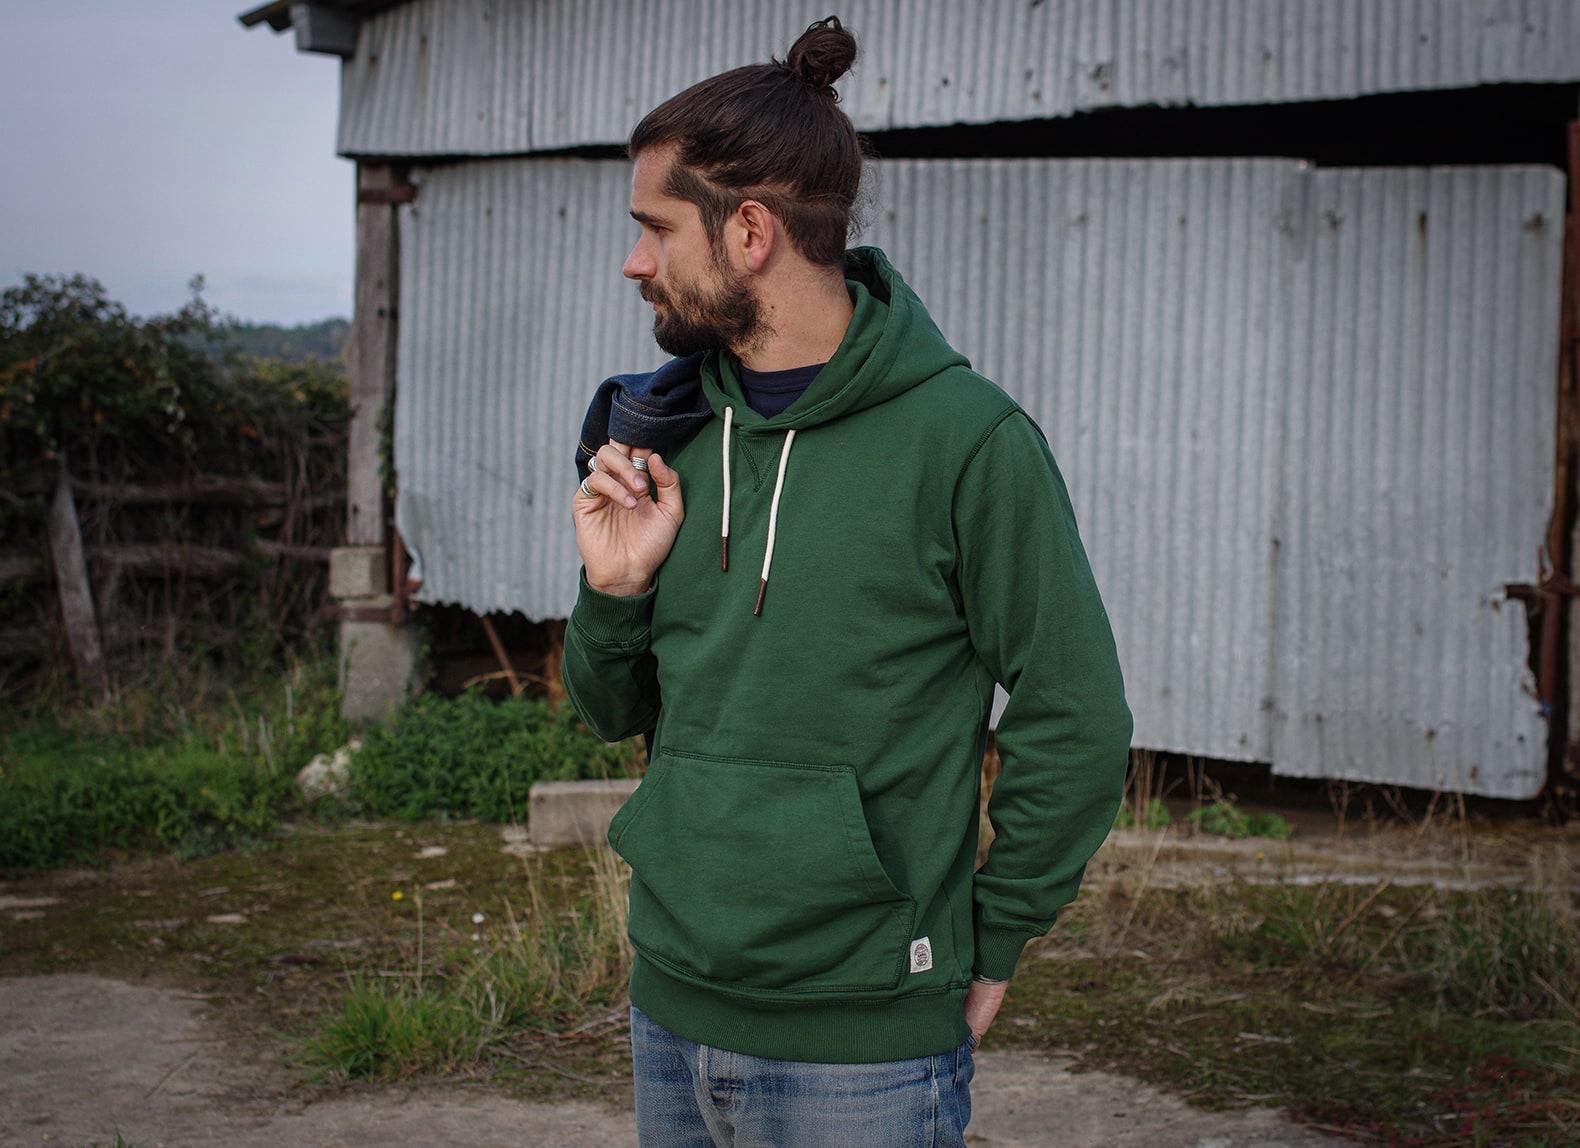 idée look avec un hoodie vintage vert stylé homme workwear